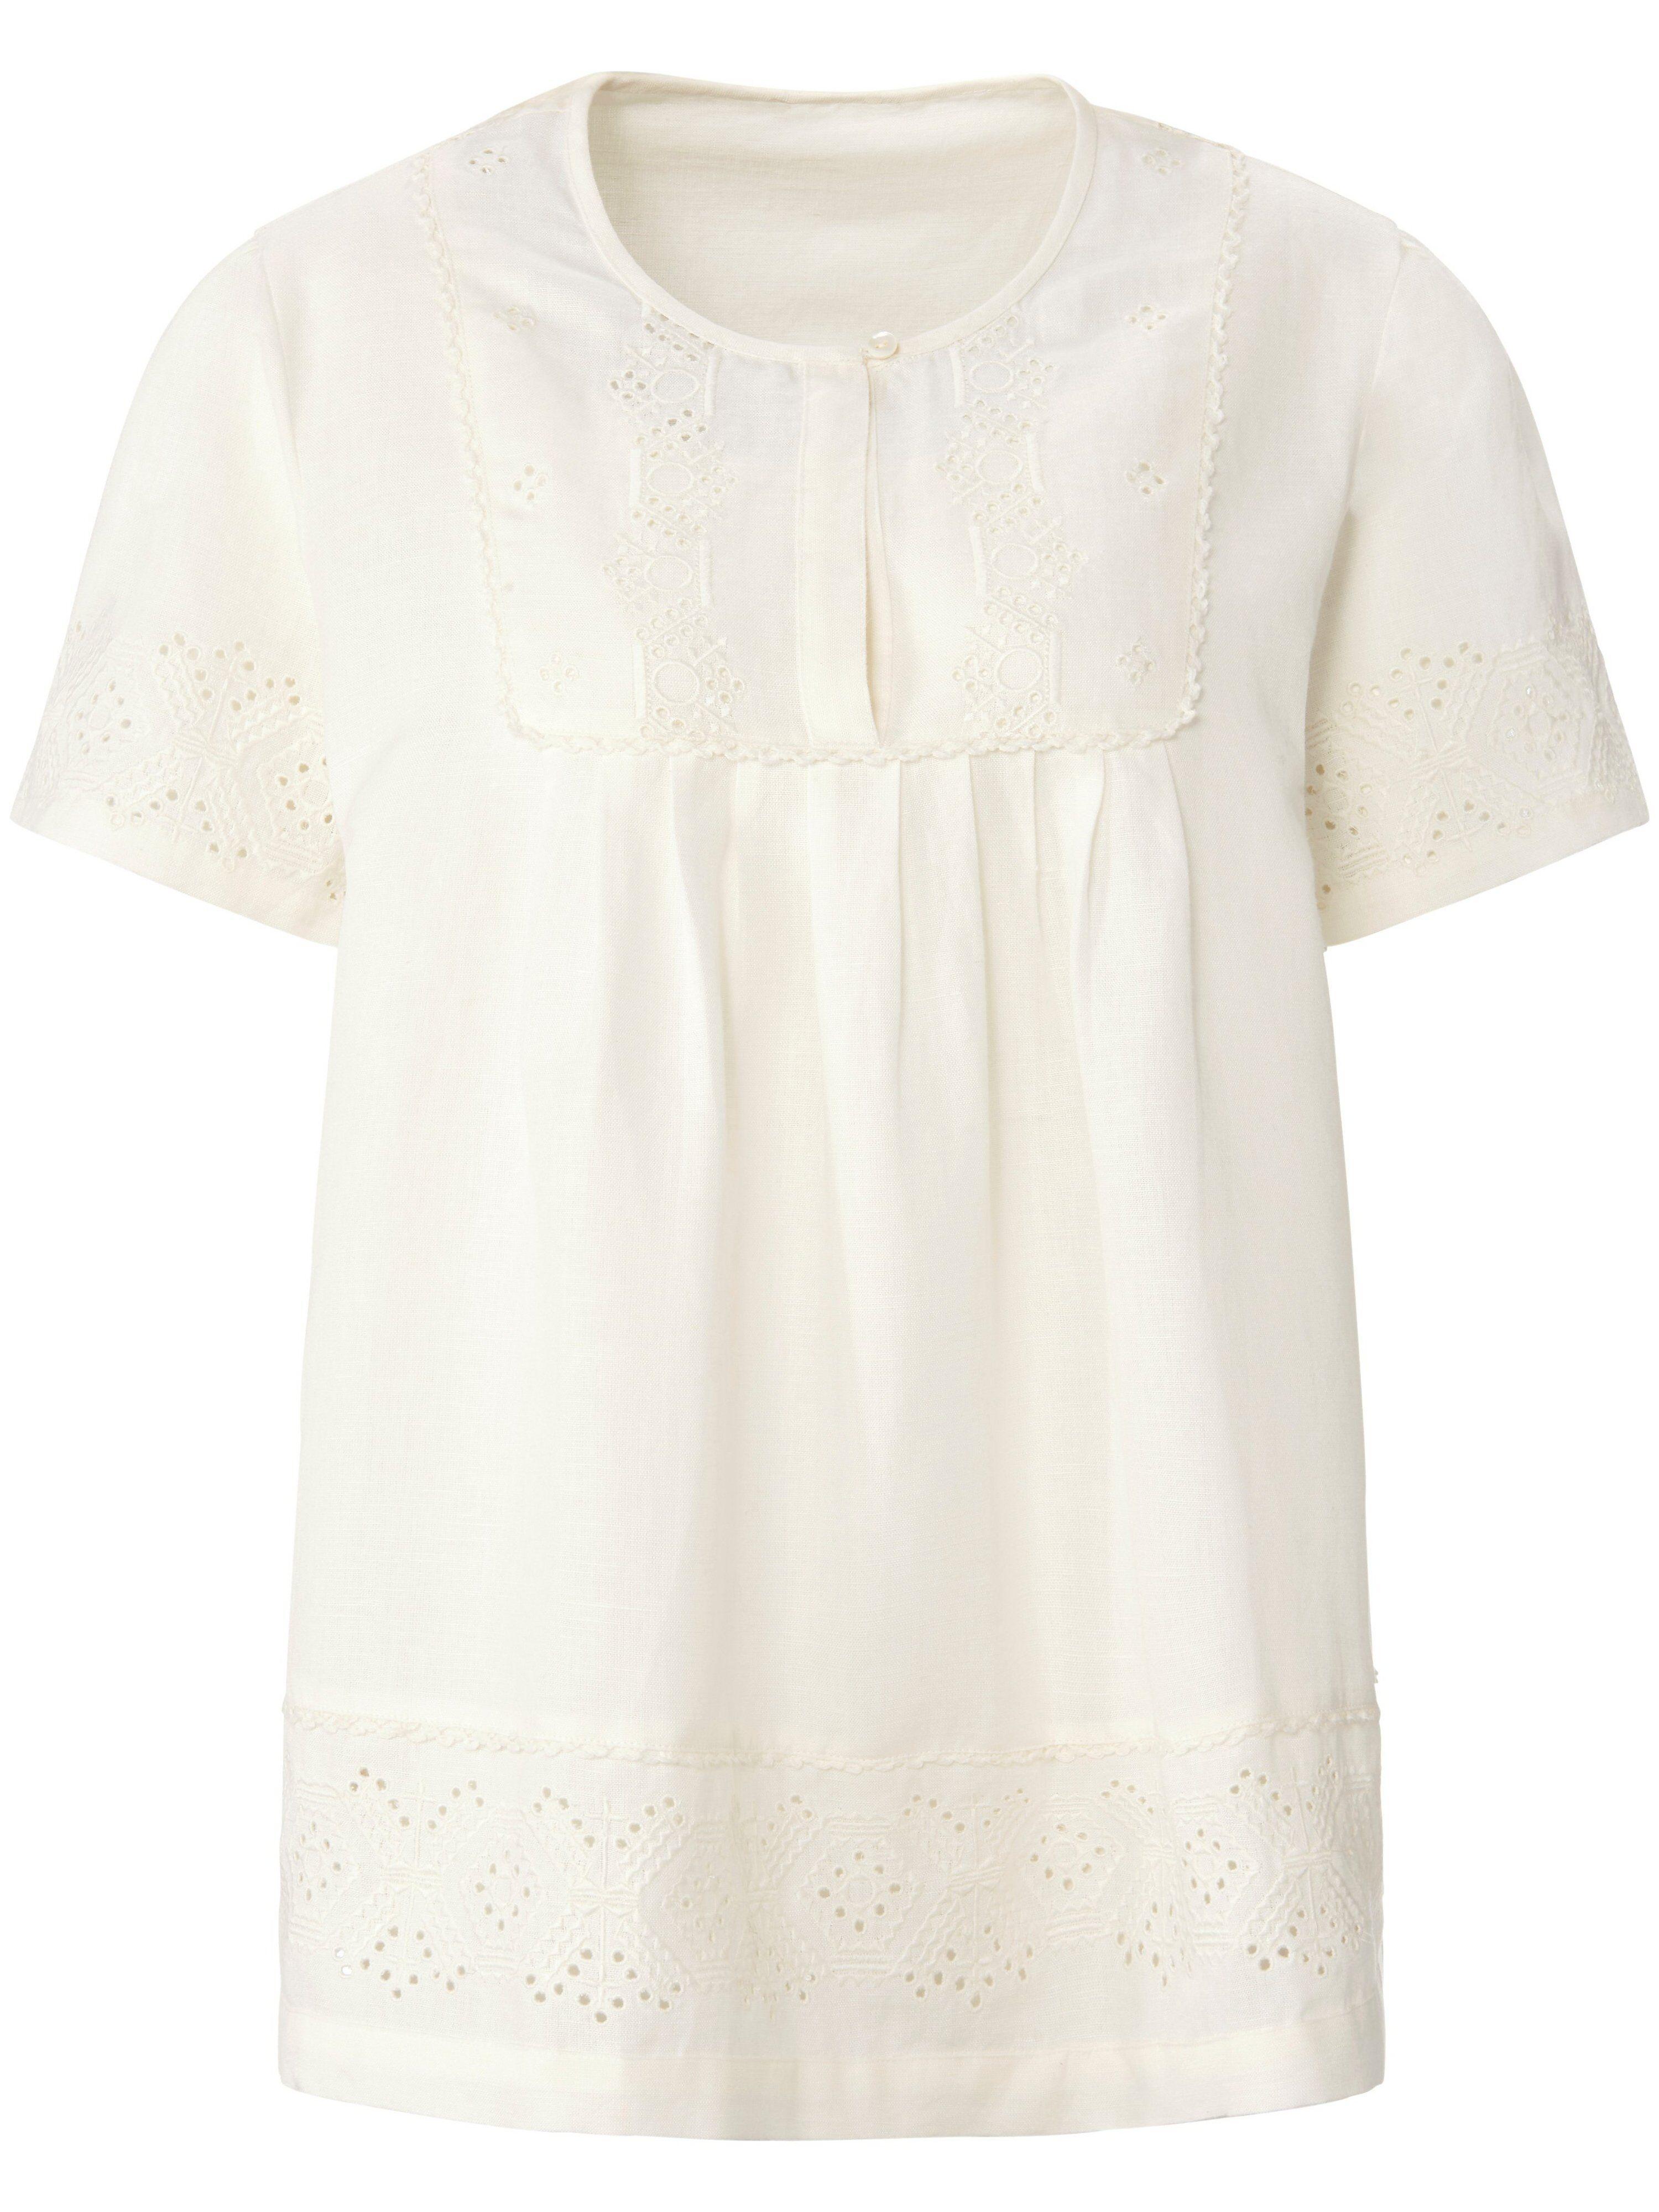 Inkadoro La blouse avec plastron fermé par petits boutons  Inkadoro blanc  - Femme - 38